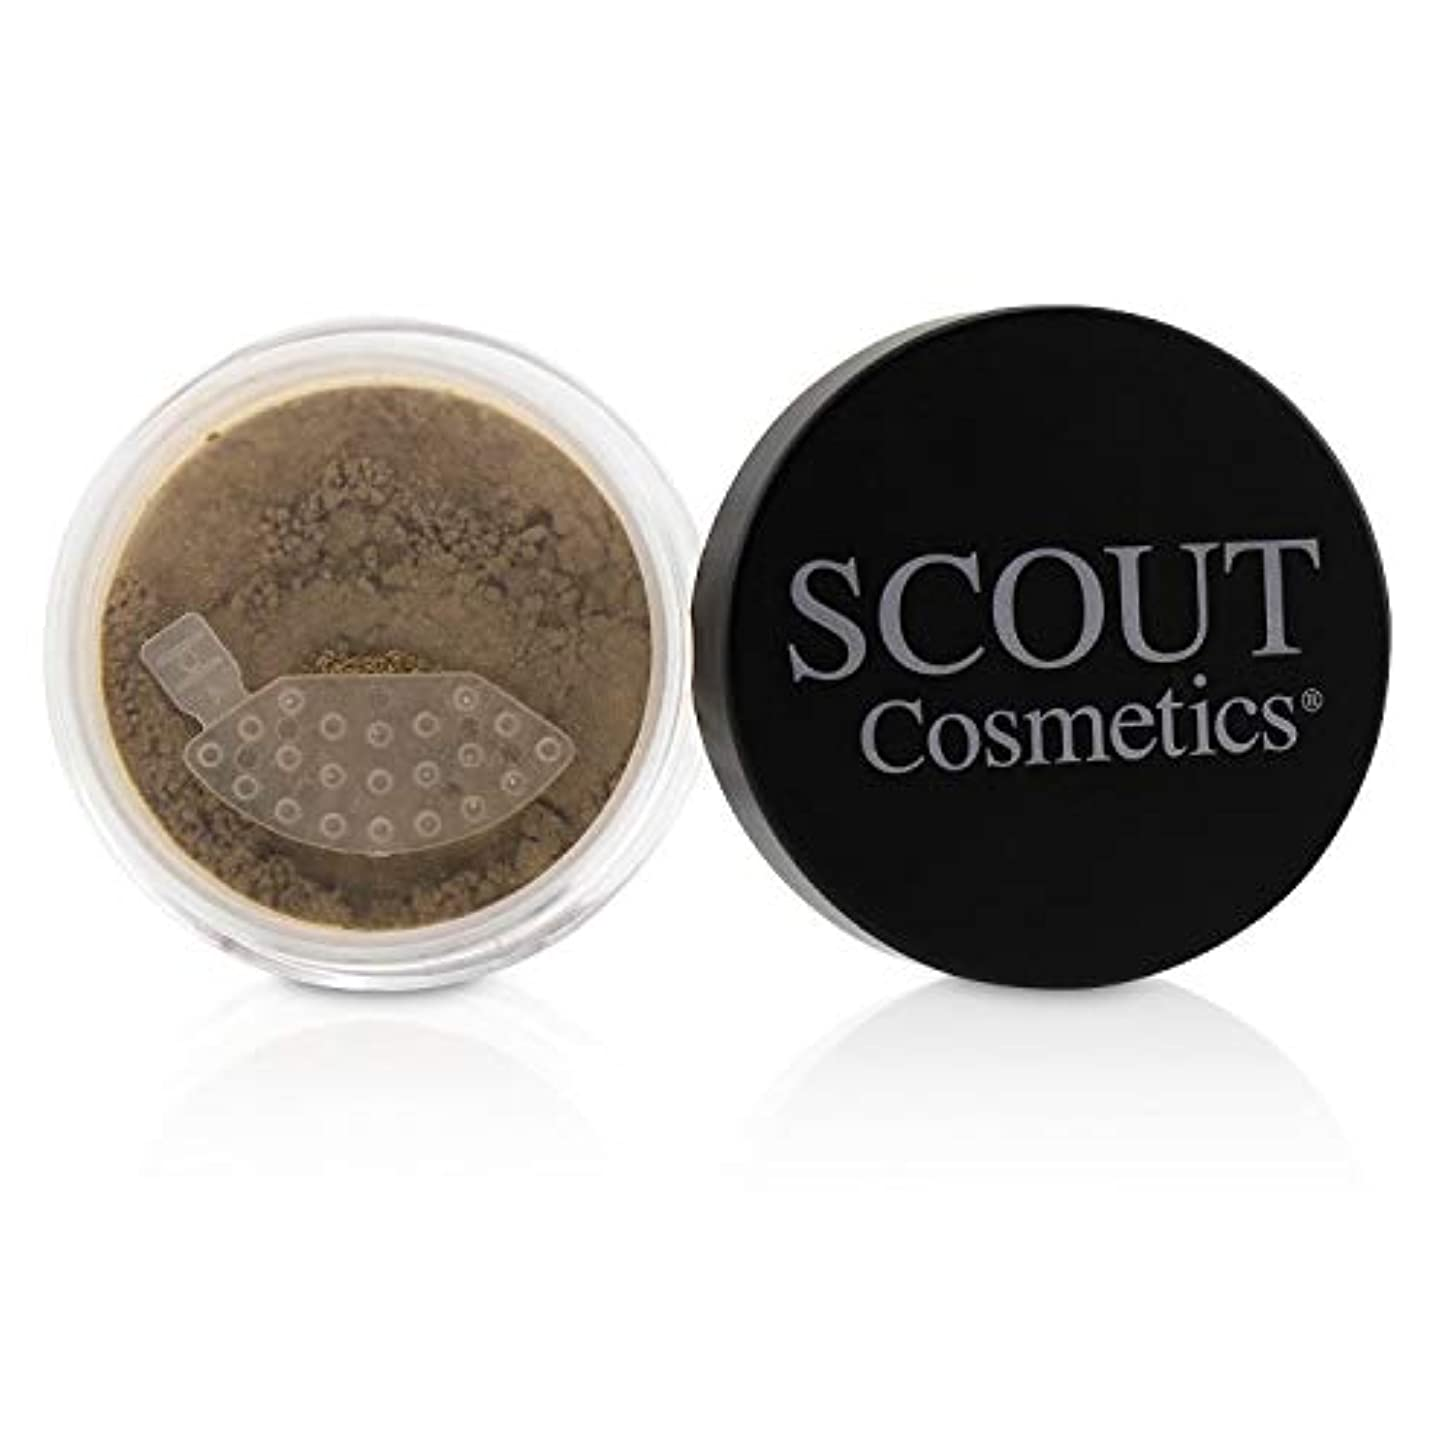 猟犬数学的な倉庫SCOUT Cosmetics Mineral Powder Foundation SPF 20 - # Almond 8g/0.28oz並行輸入品